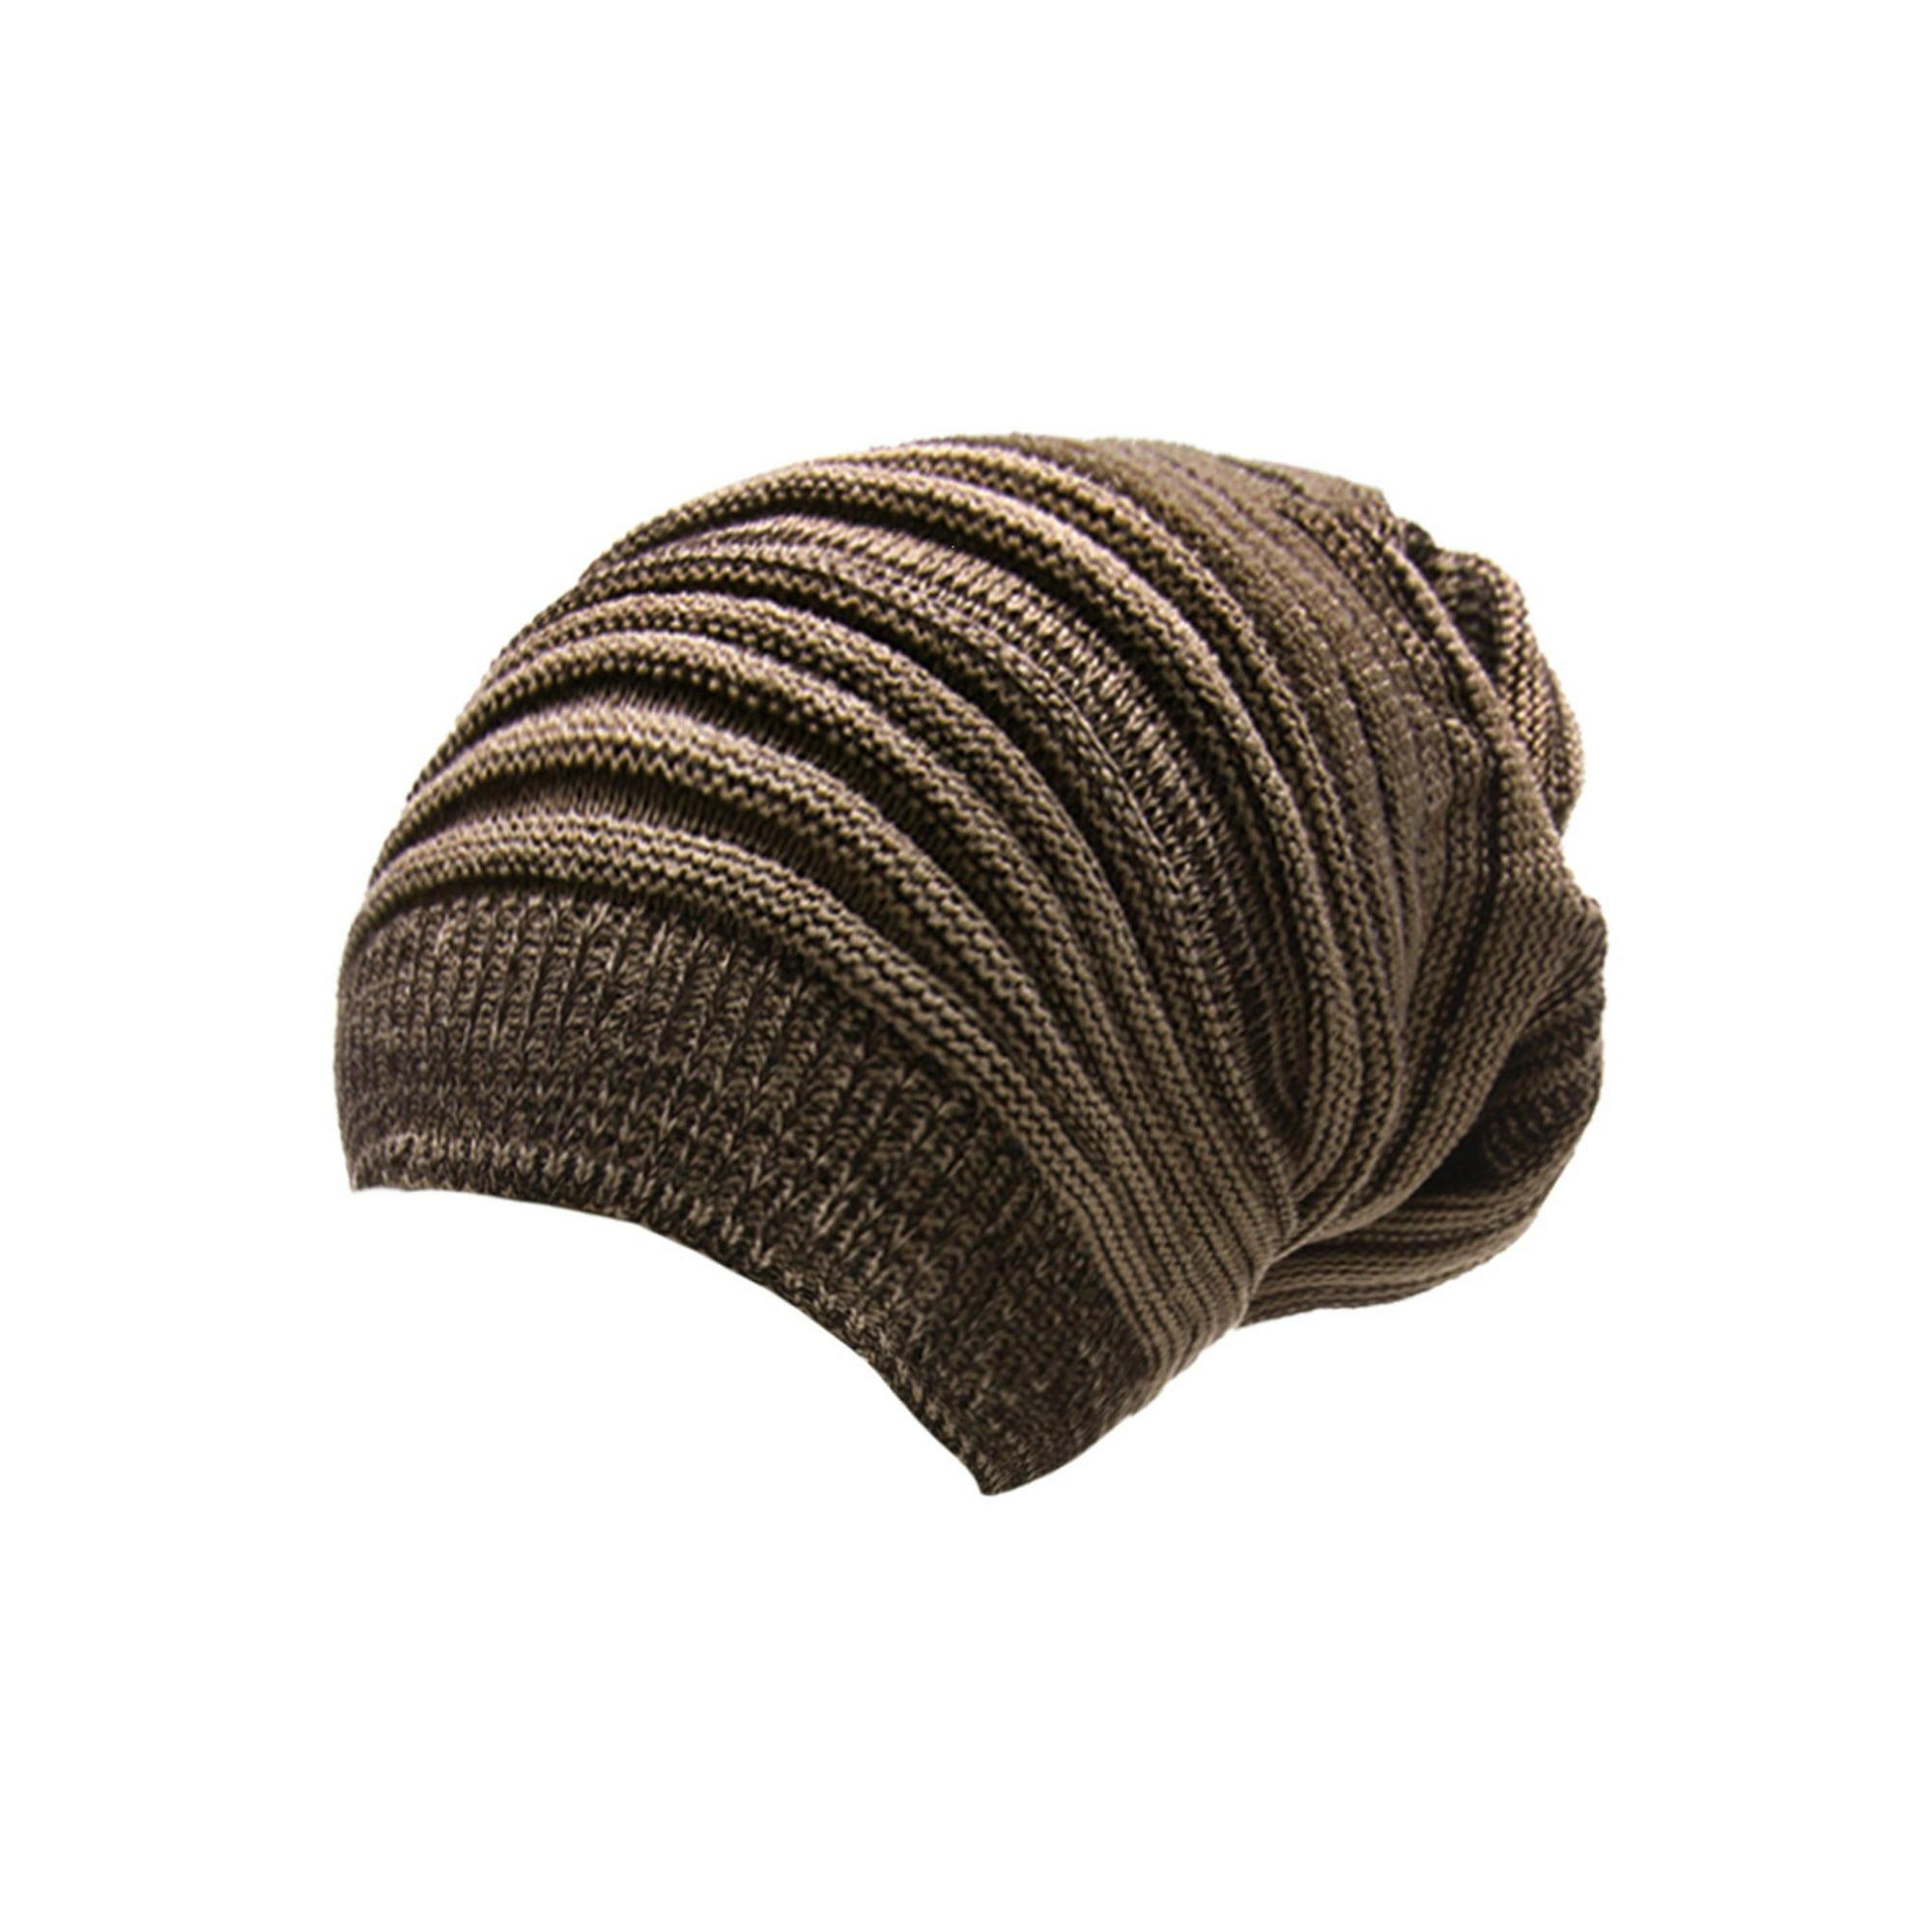 736b4156d3 Men Warm Hand Knitting Textured Design Beanie Hat Cap Coffee Dark Khaki